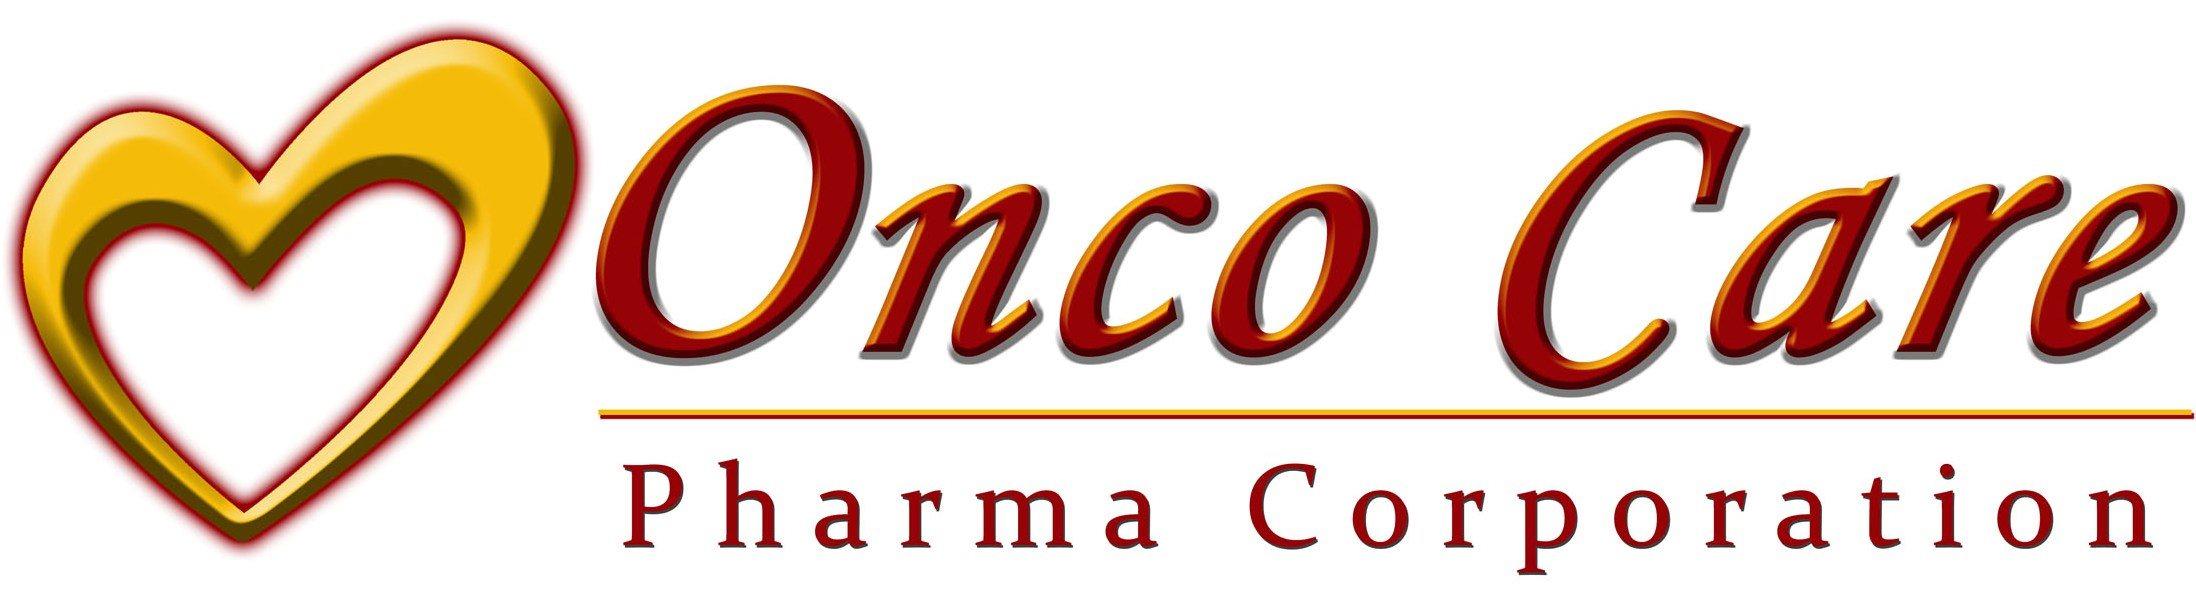 Onco Care Pharma Corporation